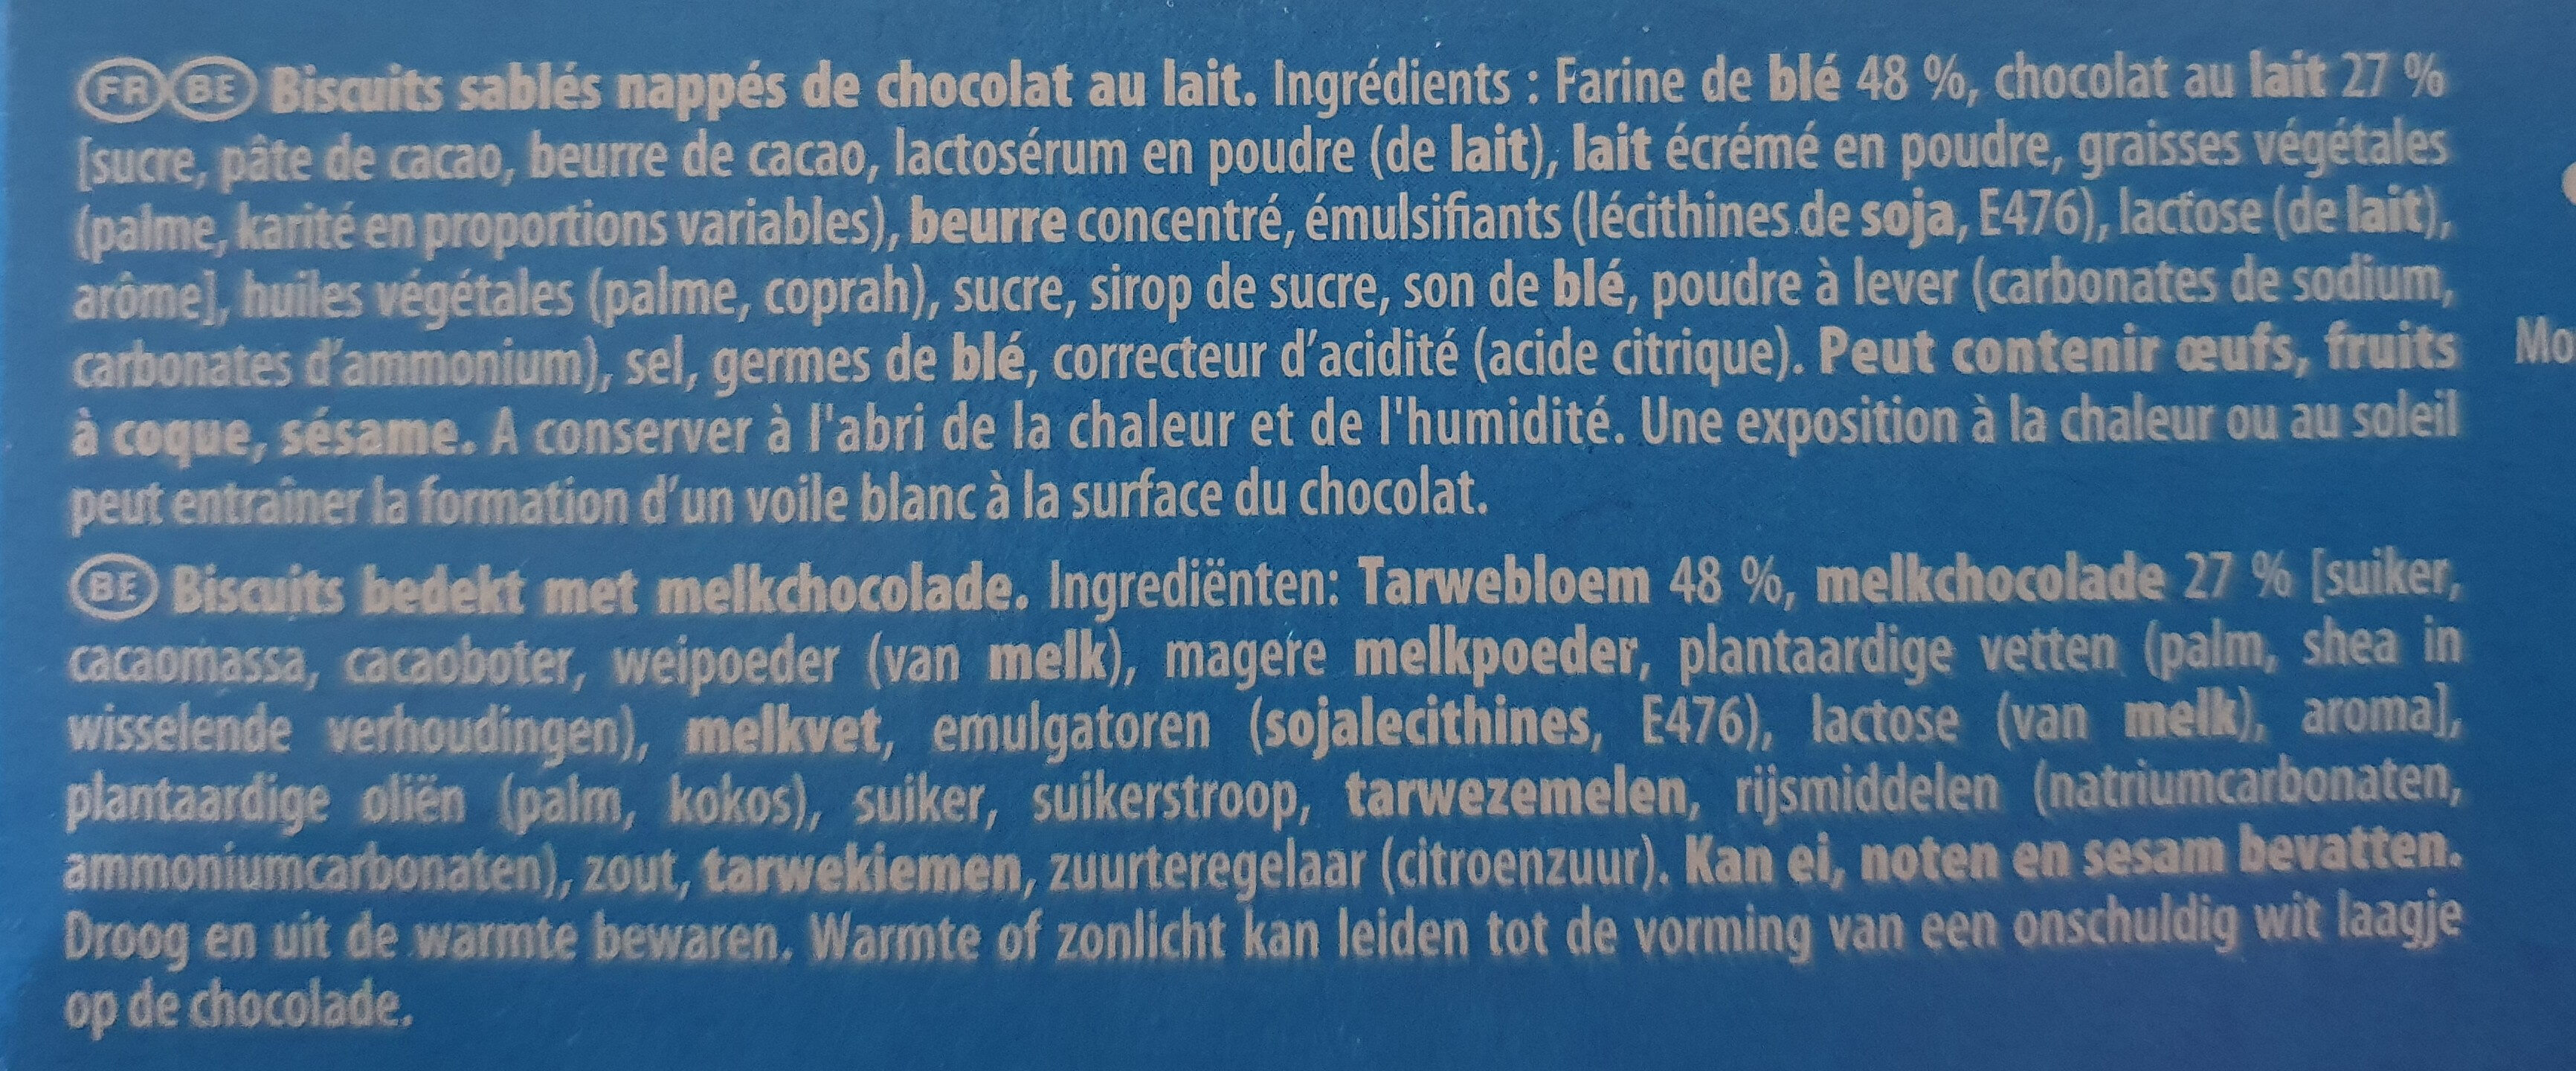 Granola - L'original - Ingrédients - fr